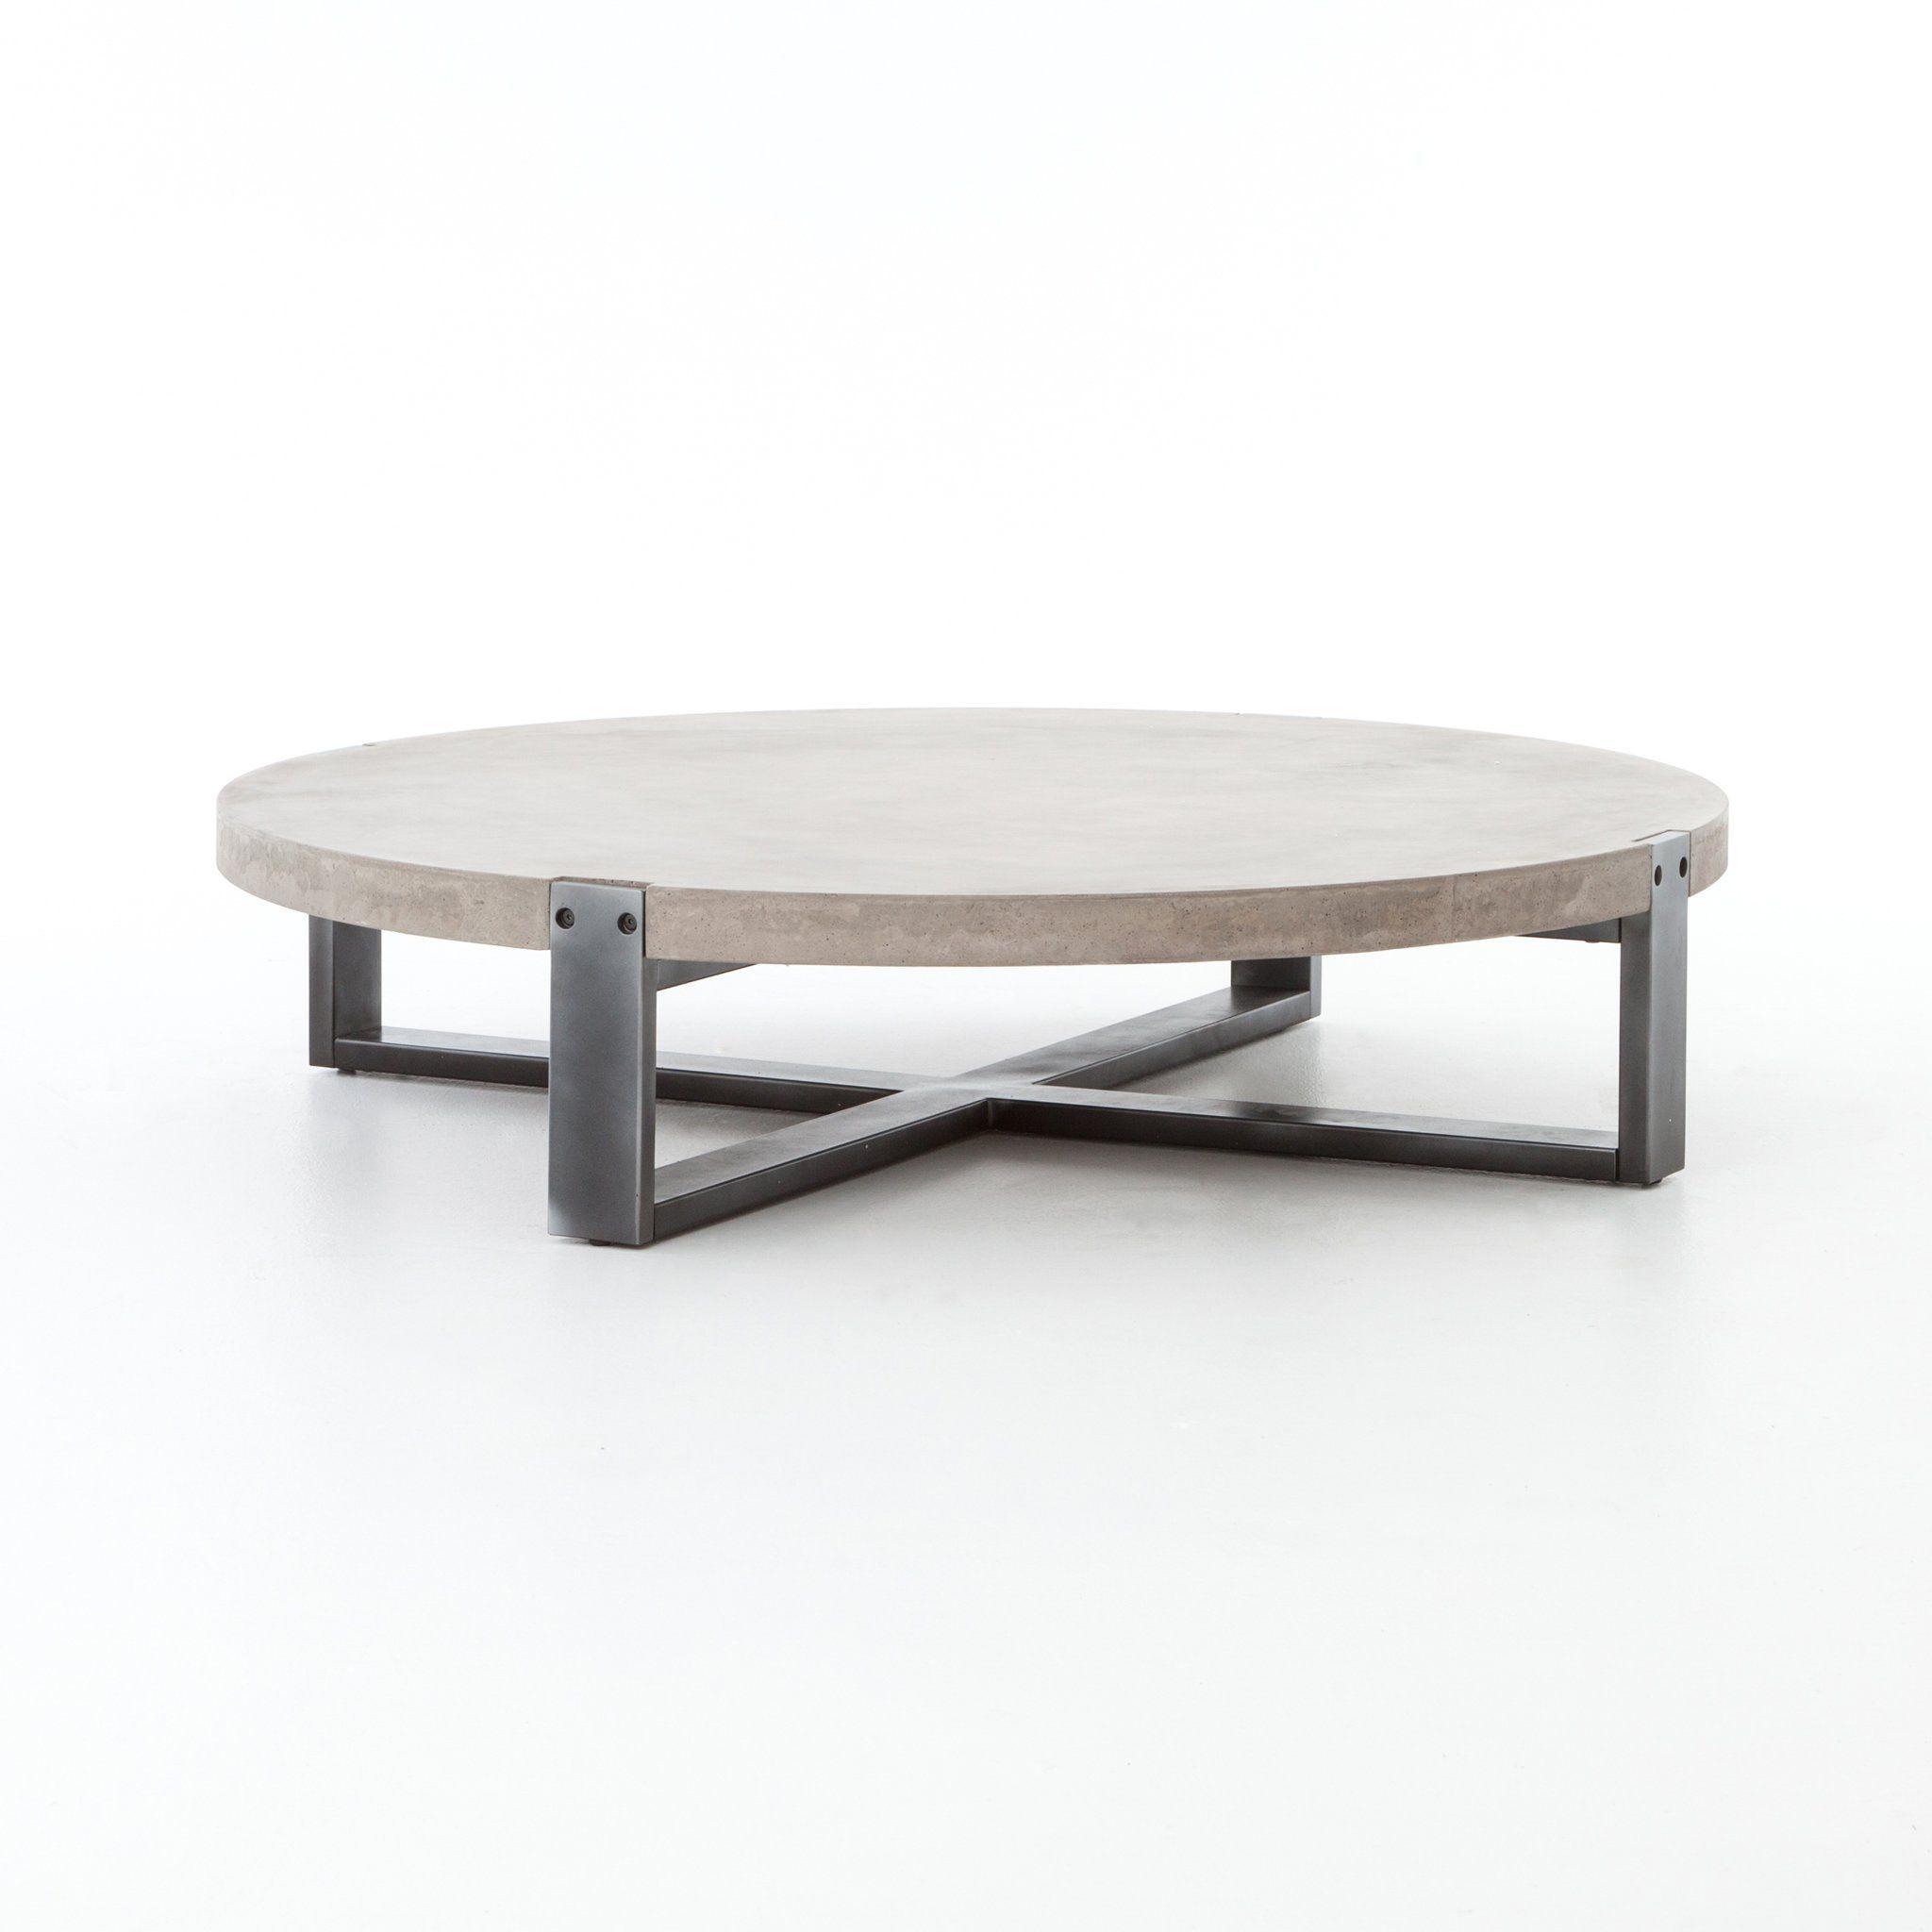 Coffee Table 1422061 Round Coffee Table Coffee Table Low Coffee Table [ 2048 x 2048 Pixel ]